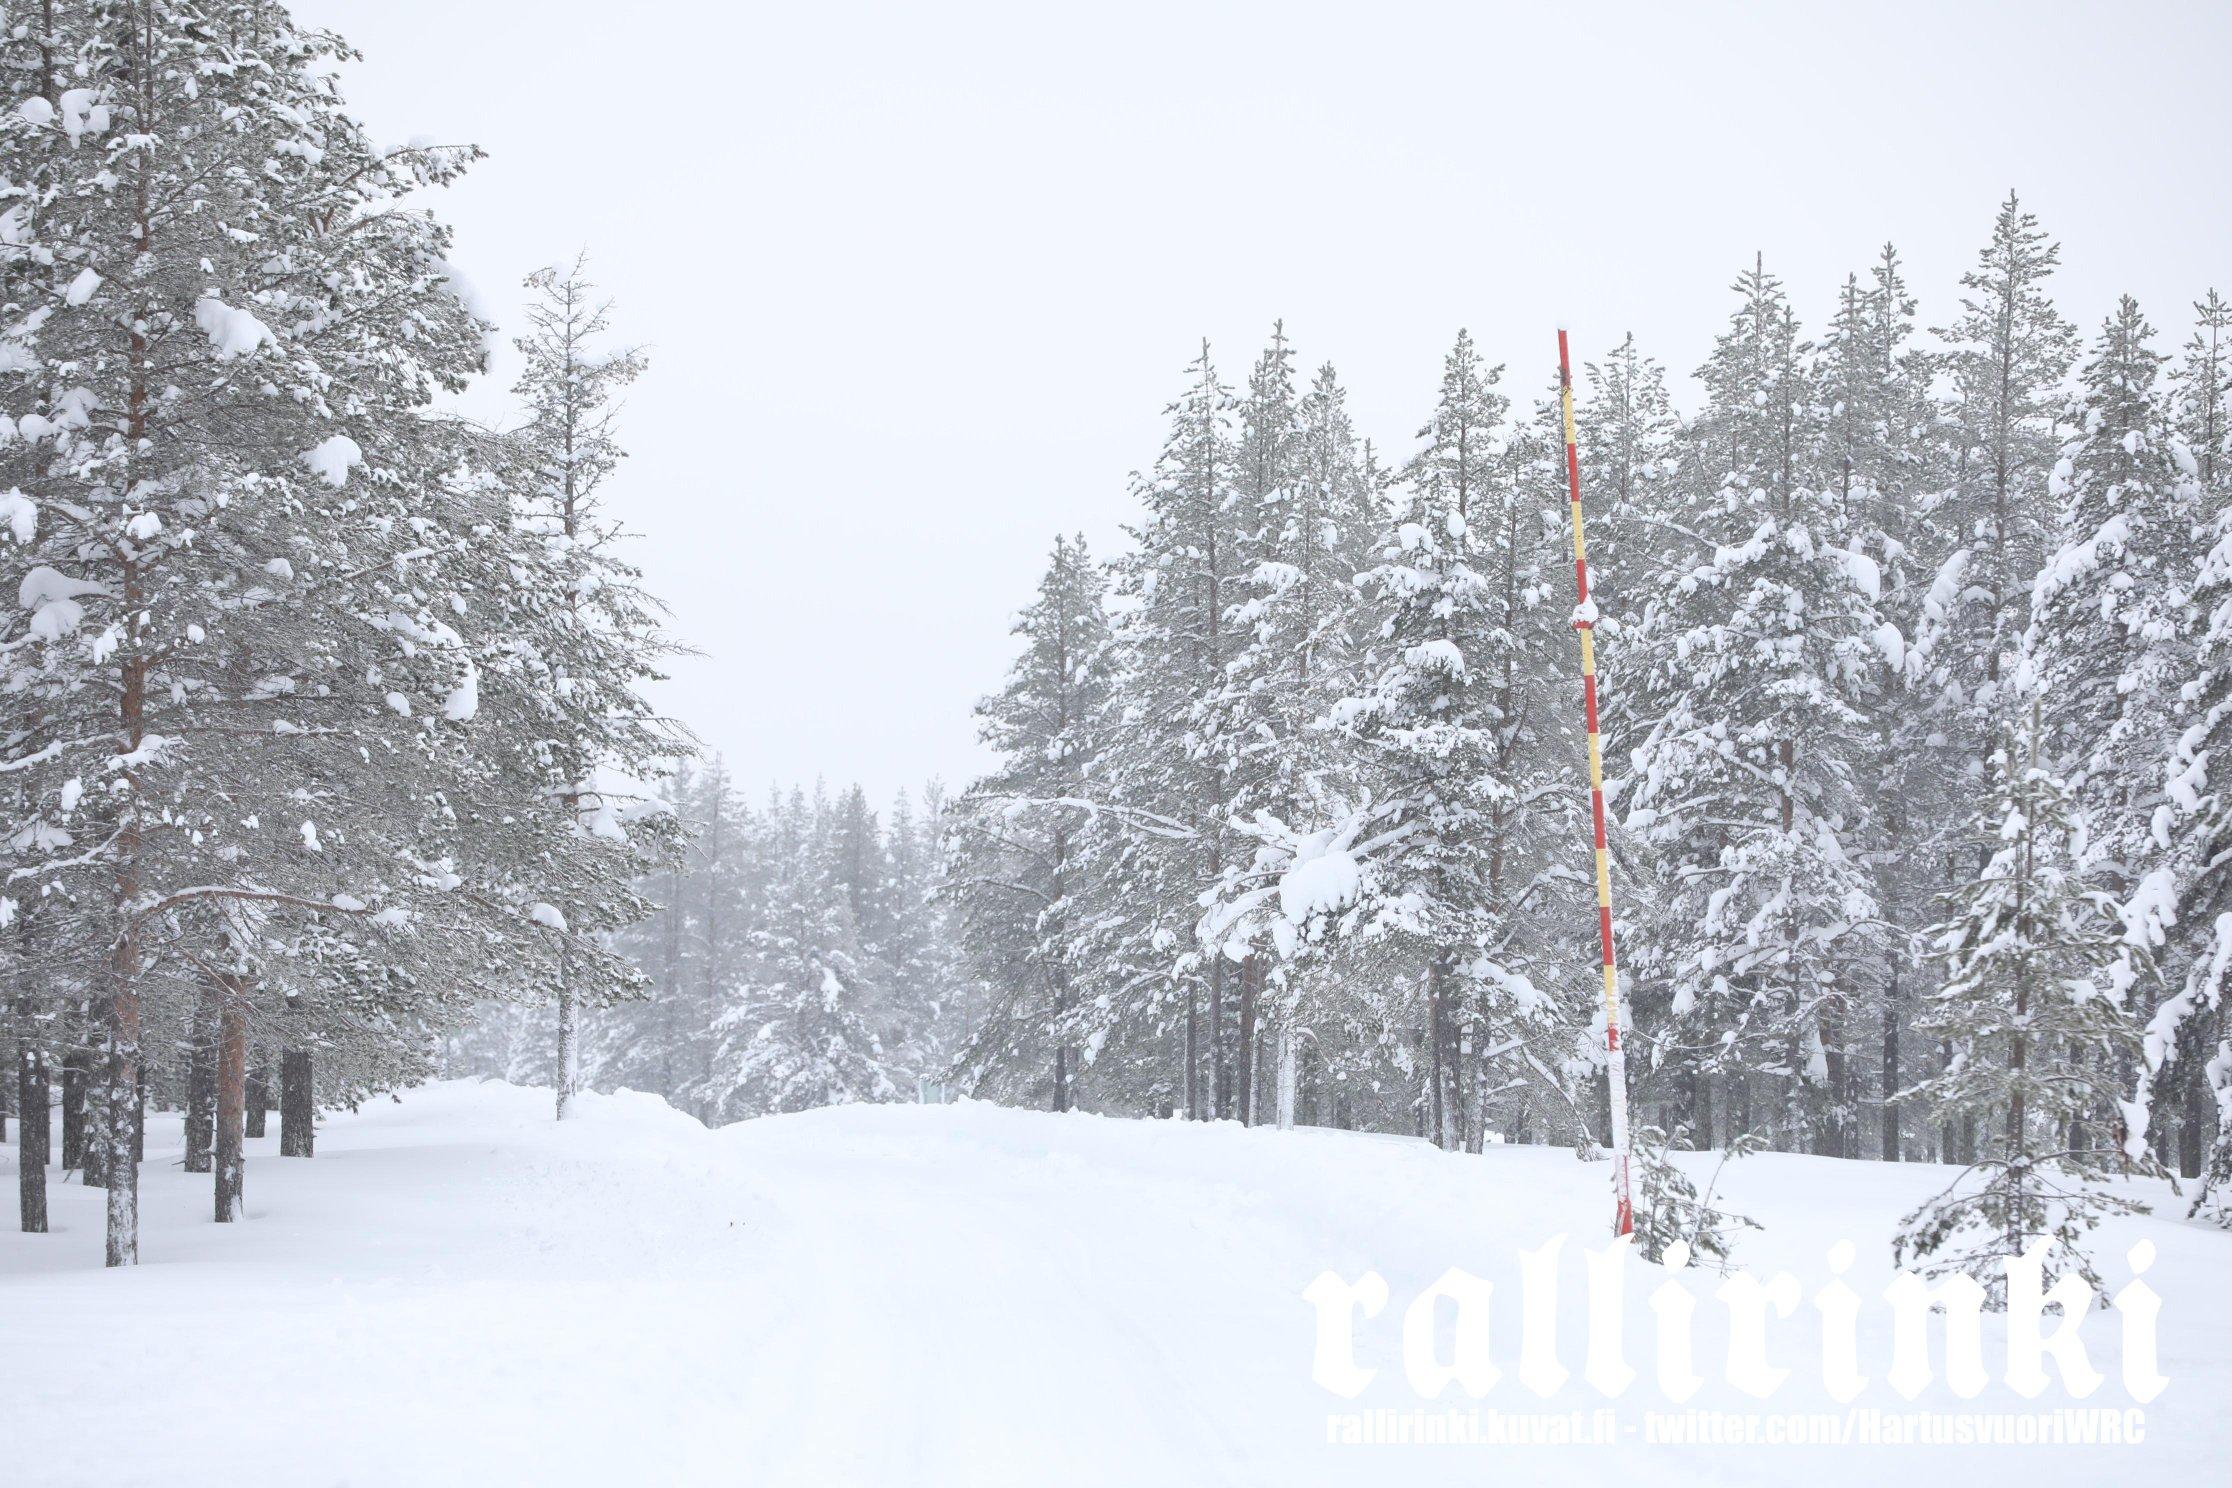 WRC: Arctic Rally Finland - Powered by CapitalBox [26-28 Febrero] Eu_PHMUXAAE1F4s?format=jpg&name=4096x4096